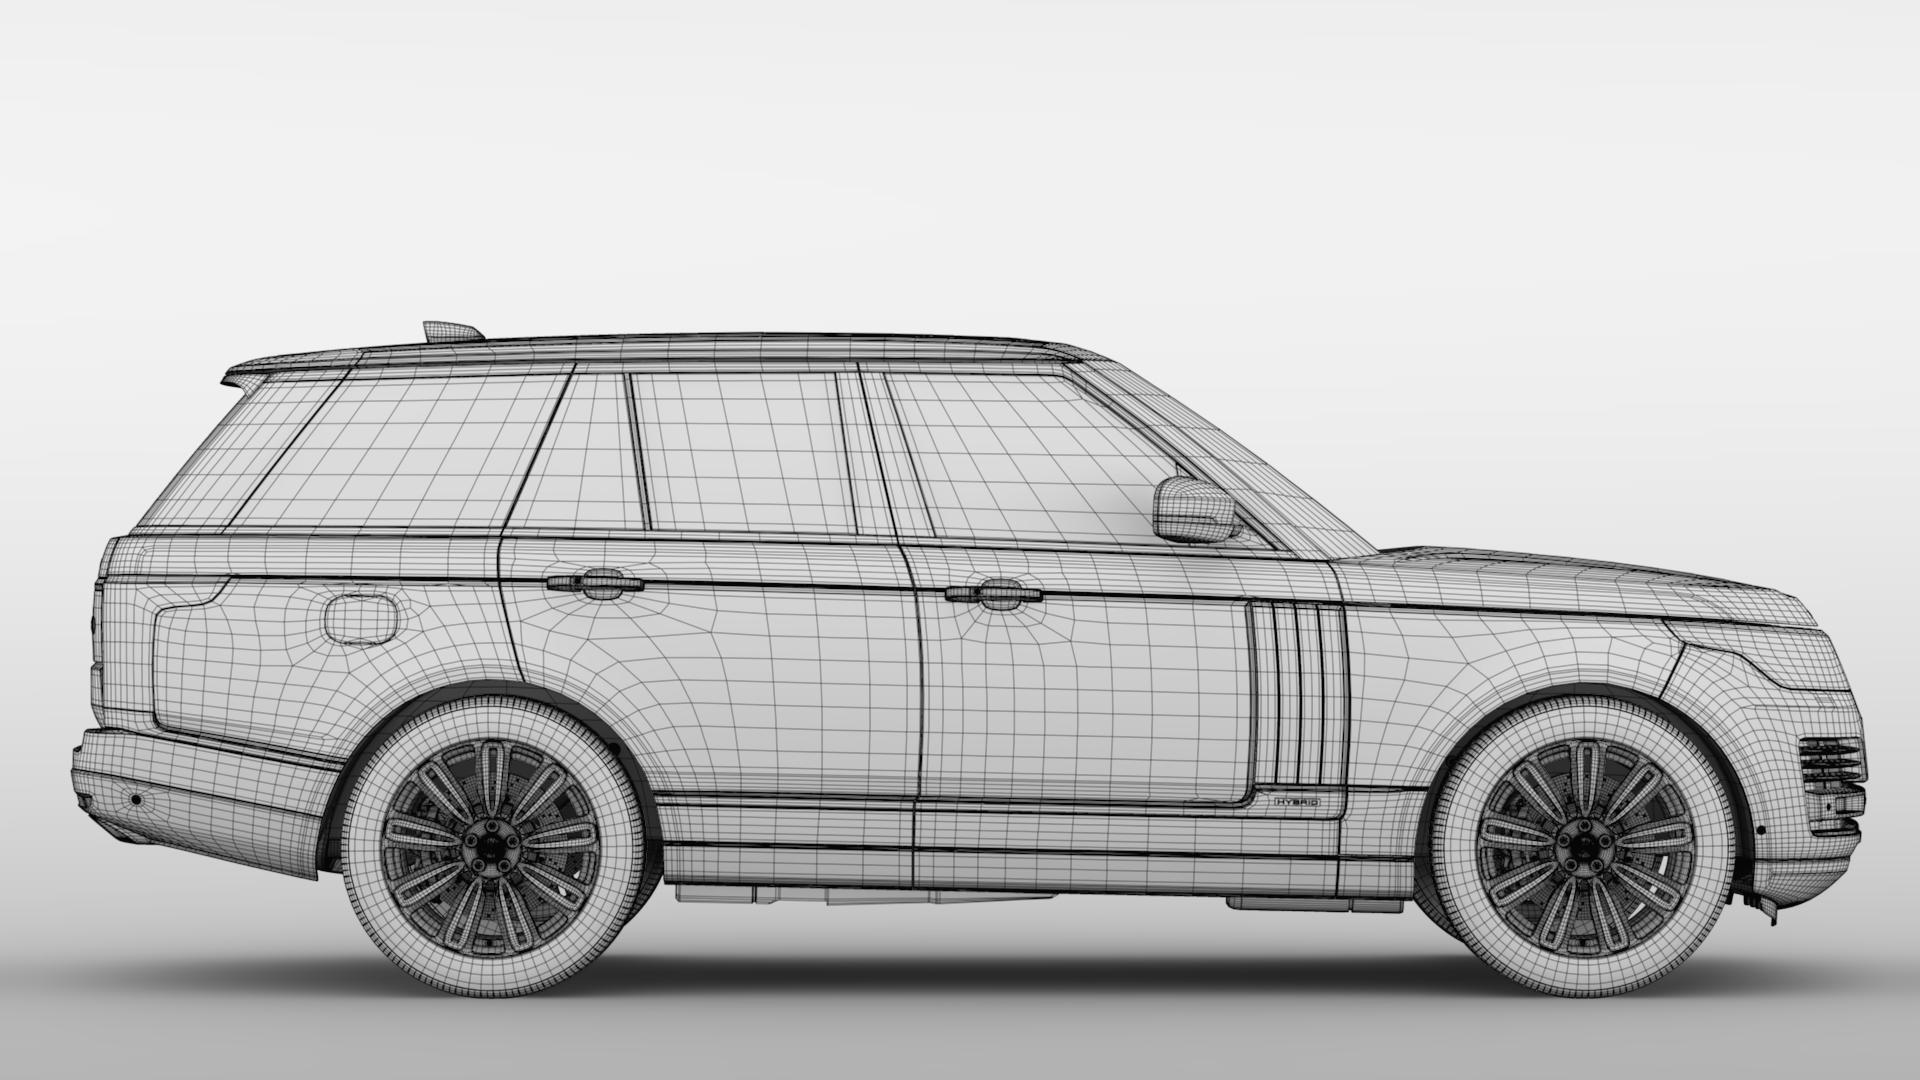 range rover autobiography hybrid (l405) 2018 3d model max fbx c4d lwo ma mb hrc xsi obj 278159